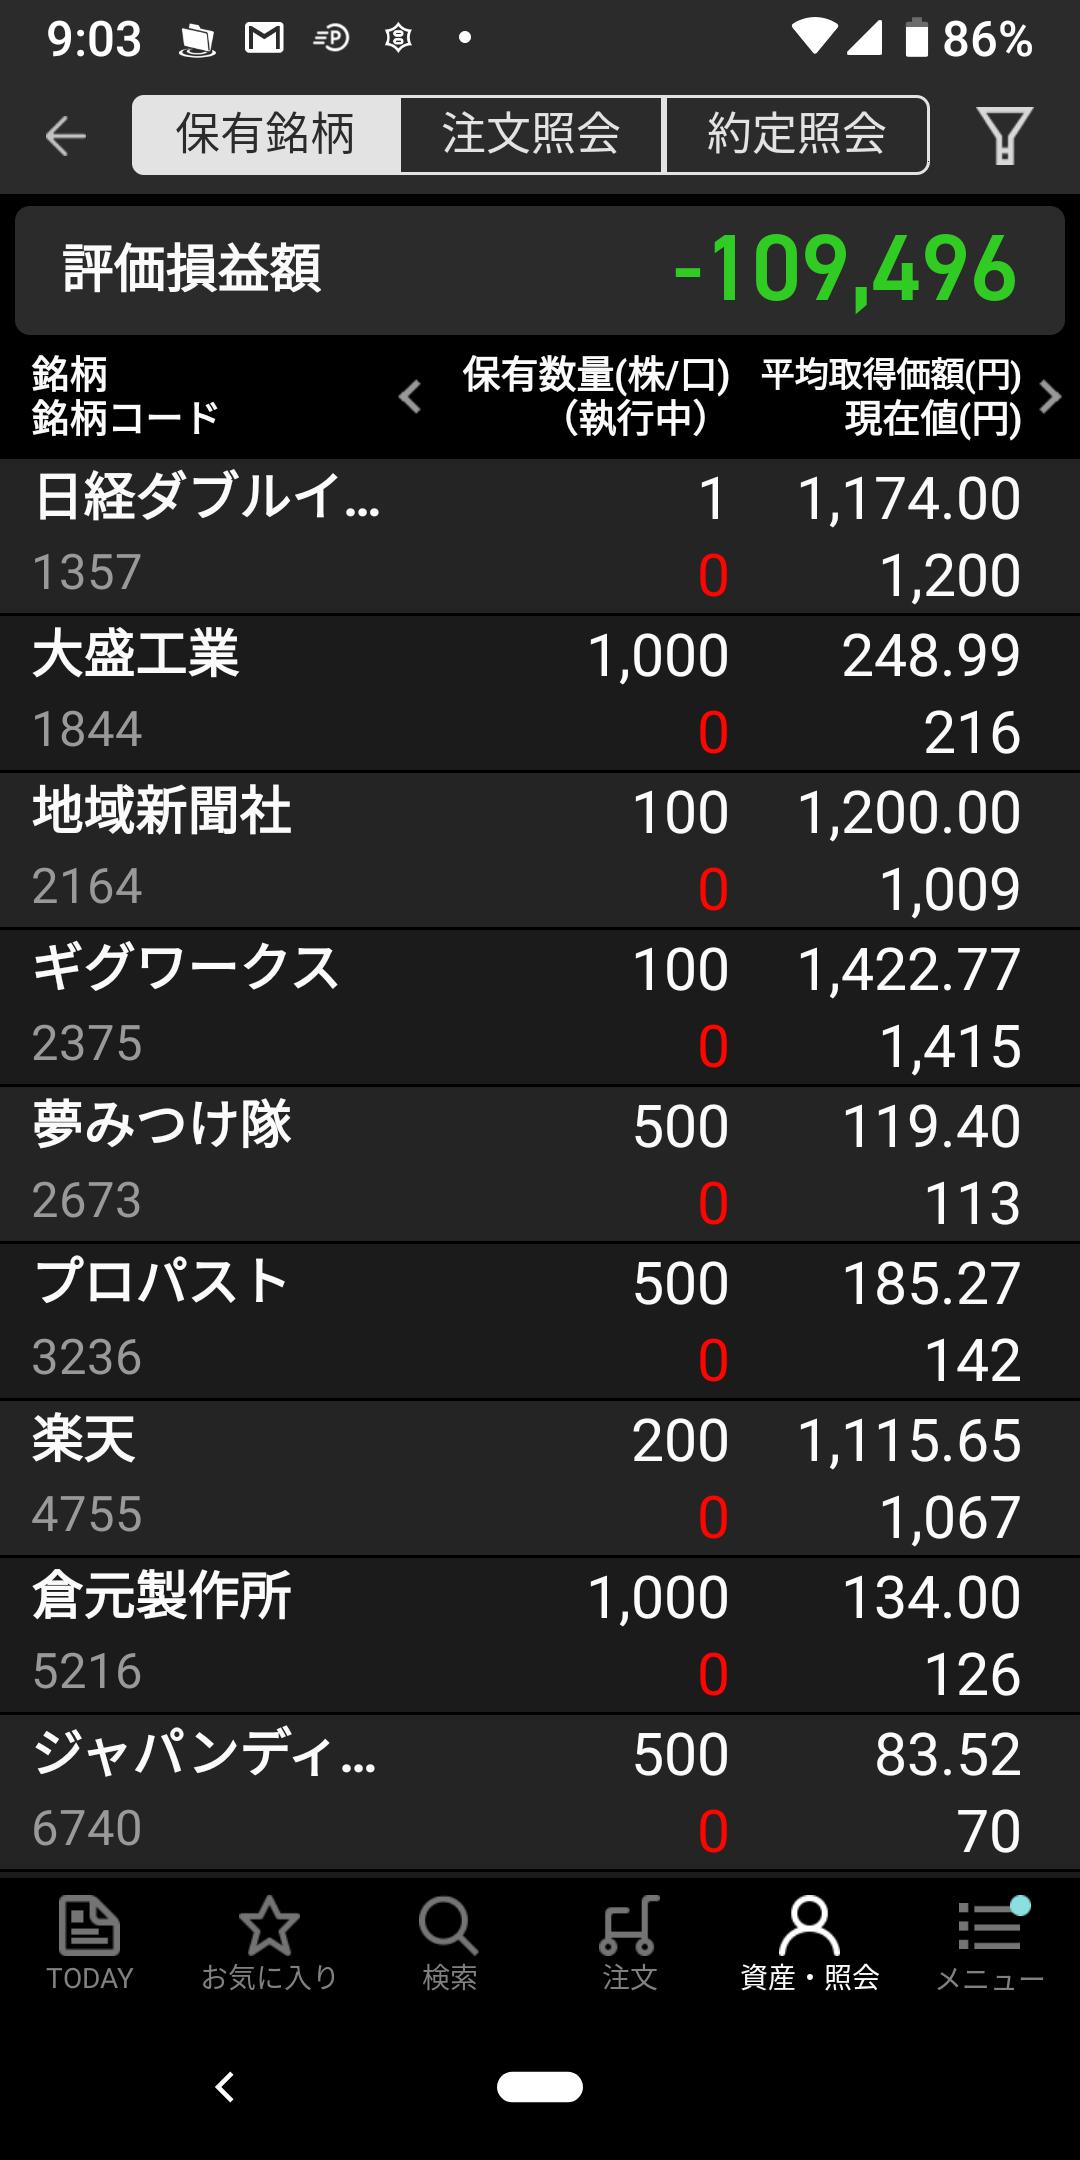 Screenshot (2019_08_09 9_03_19)